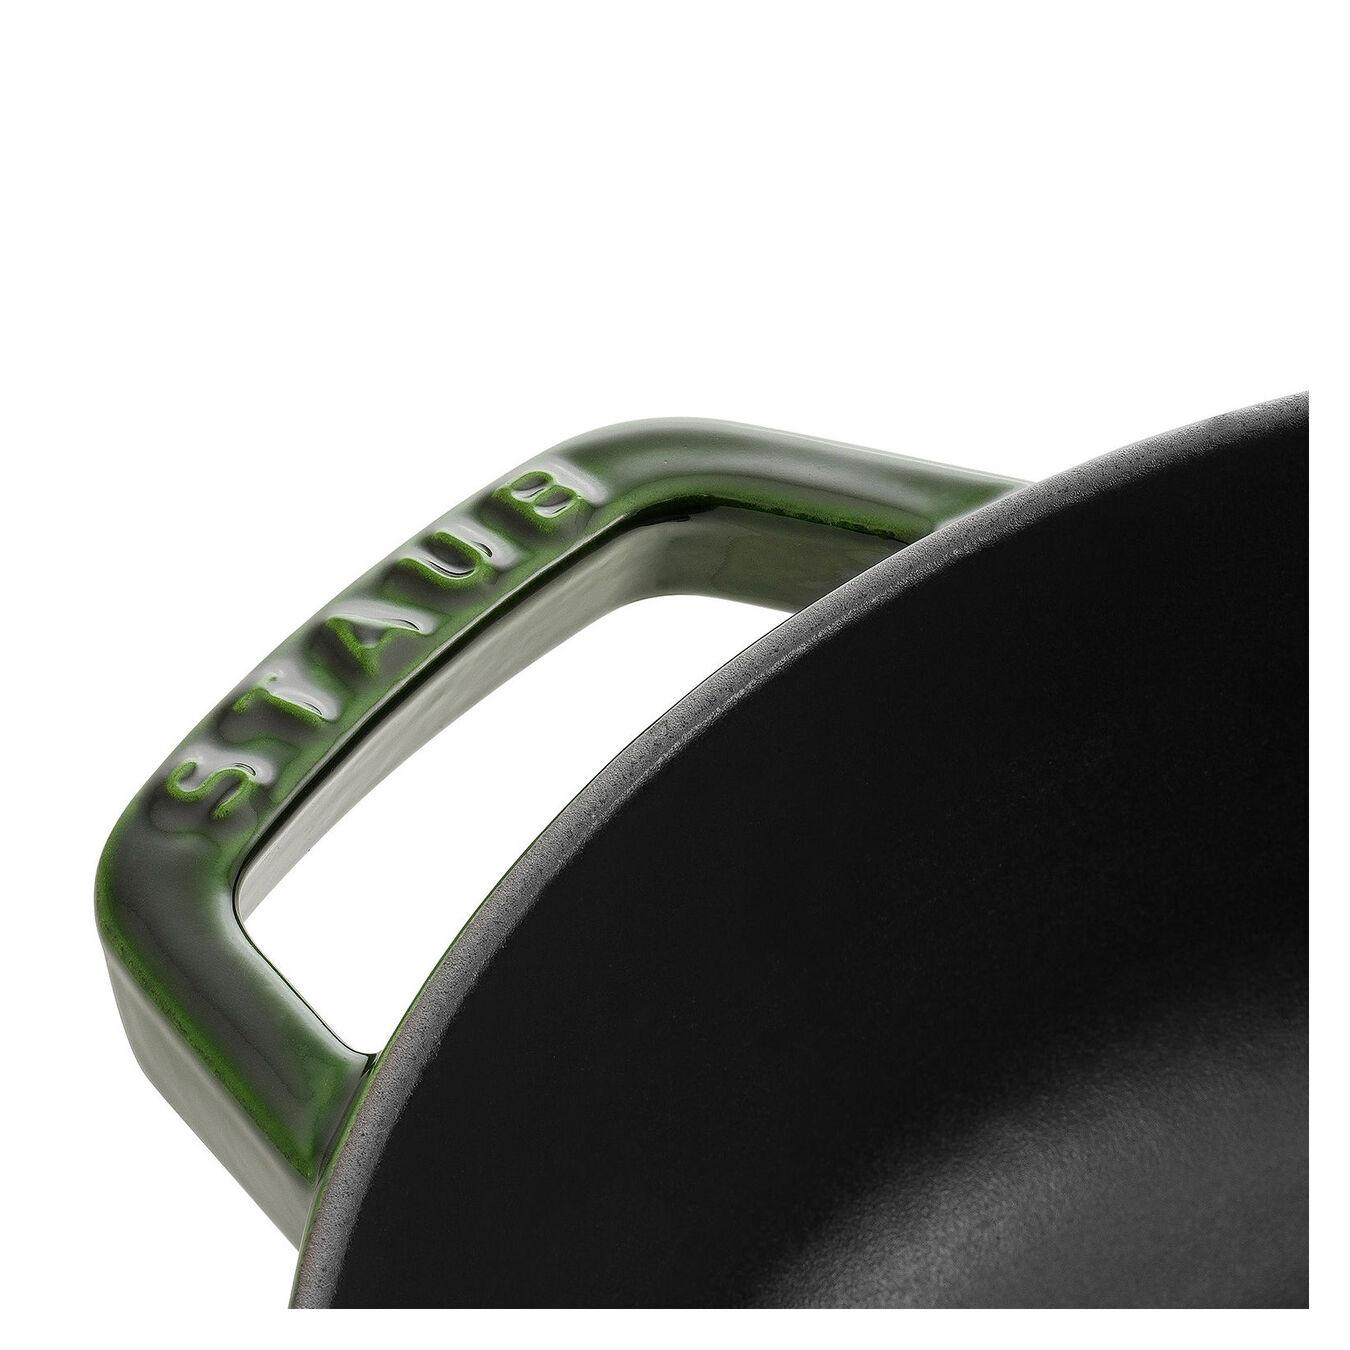 3.75 l Cast iron round Saute pan Chistera, Basil-Green,,large 3